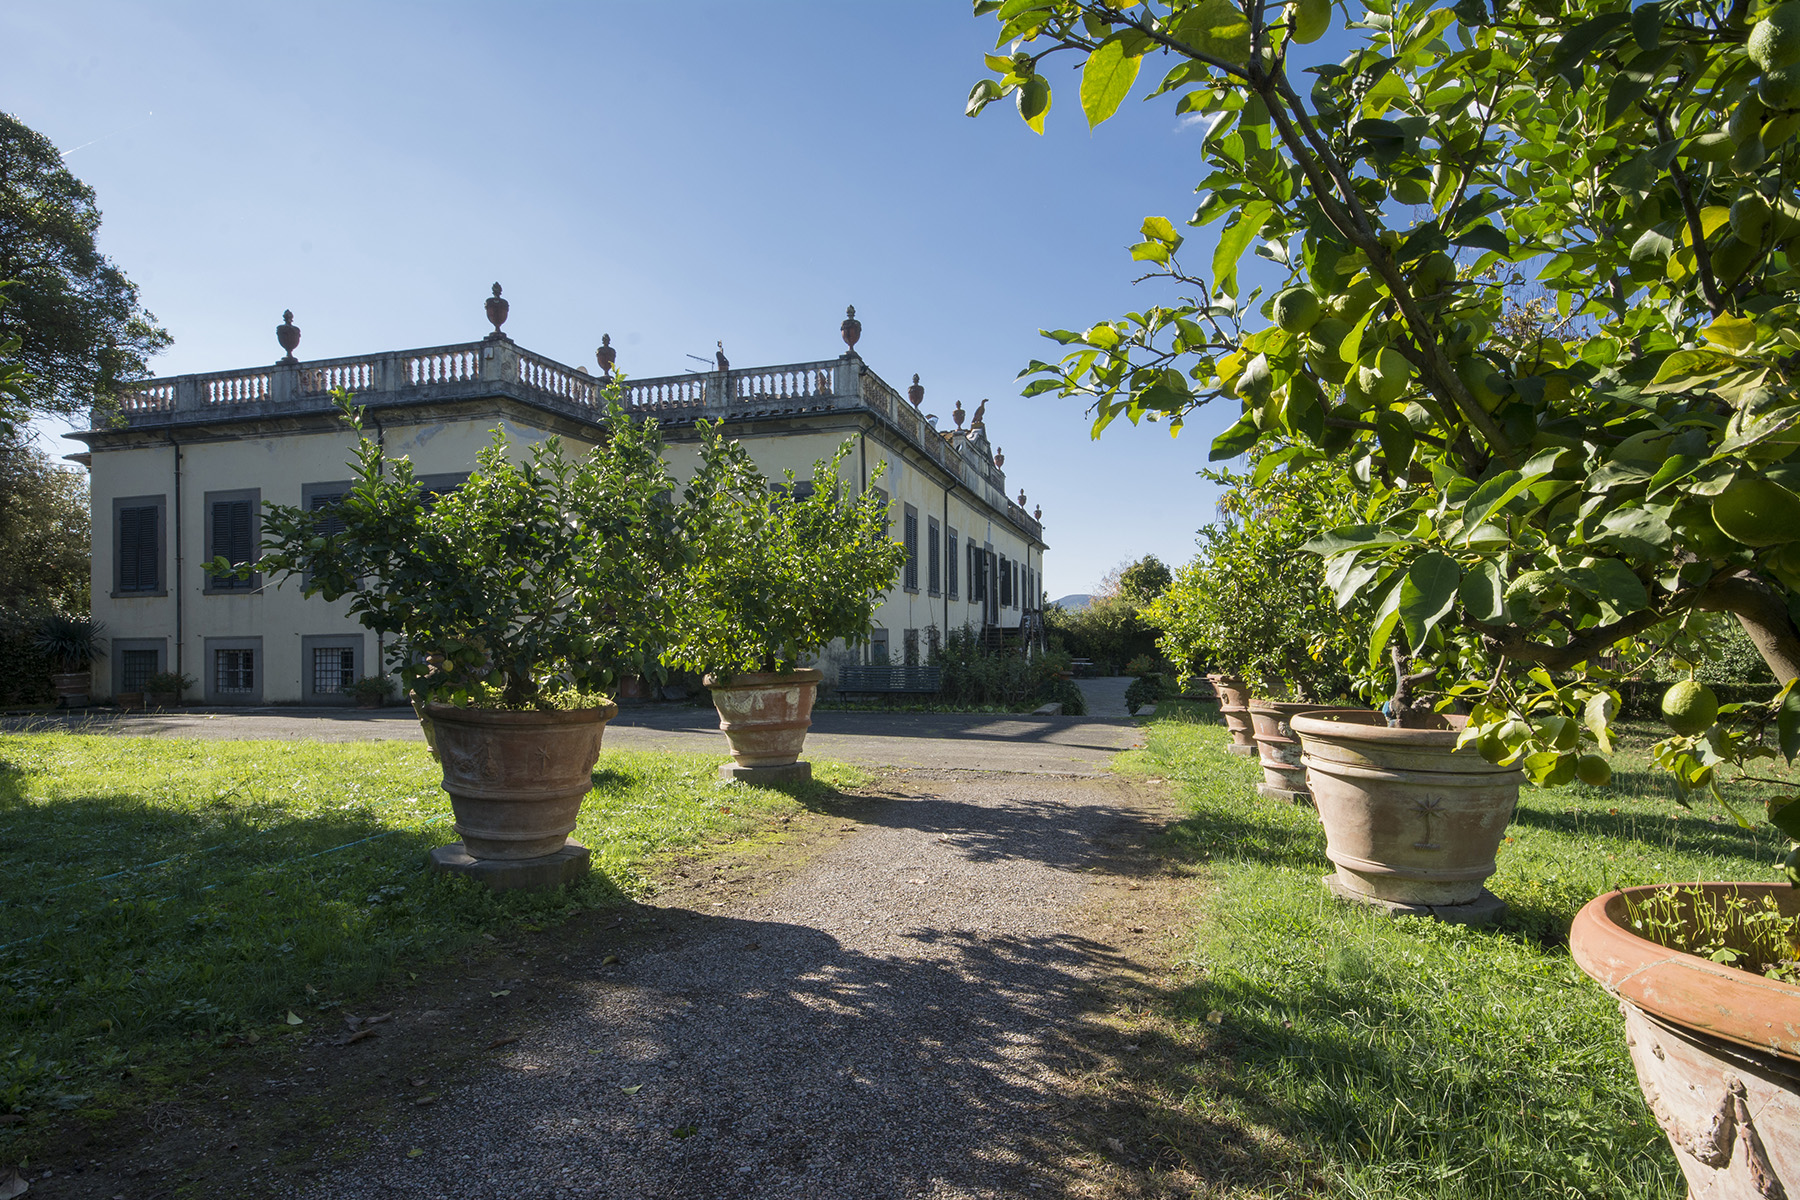 Villa in Vendita a Lucca: 5 locali, 2451 mq - Foto 18